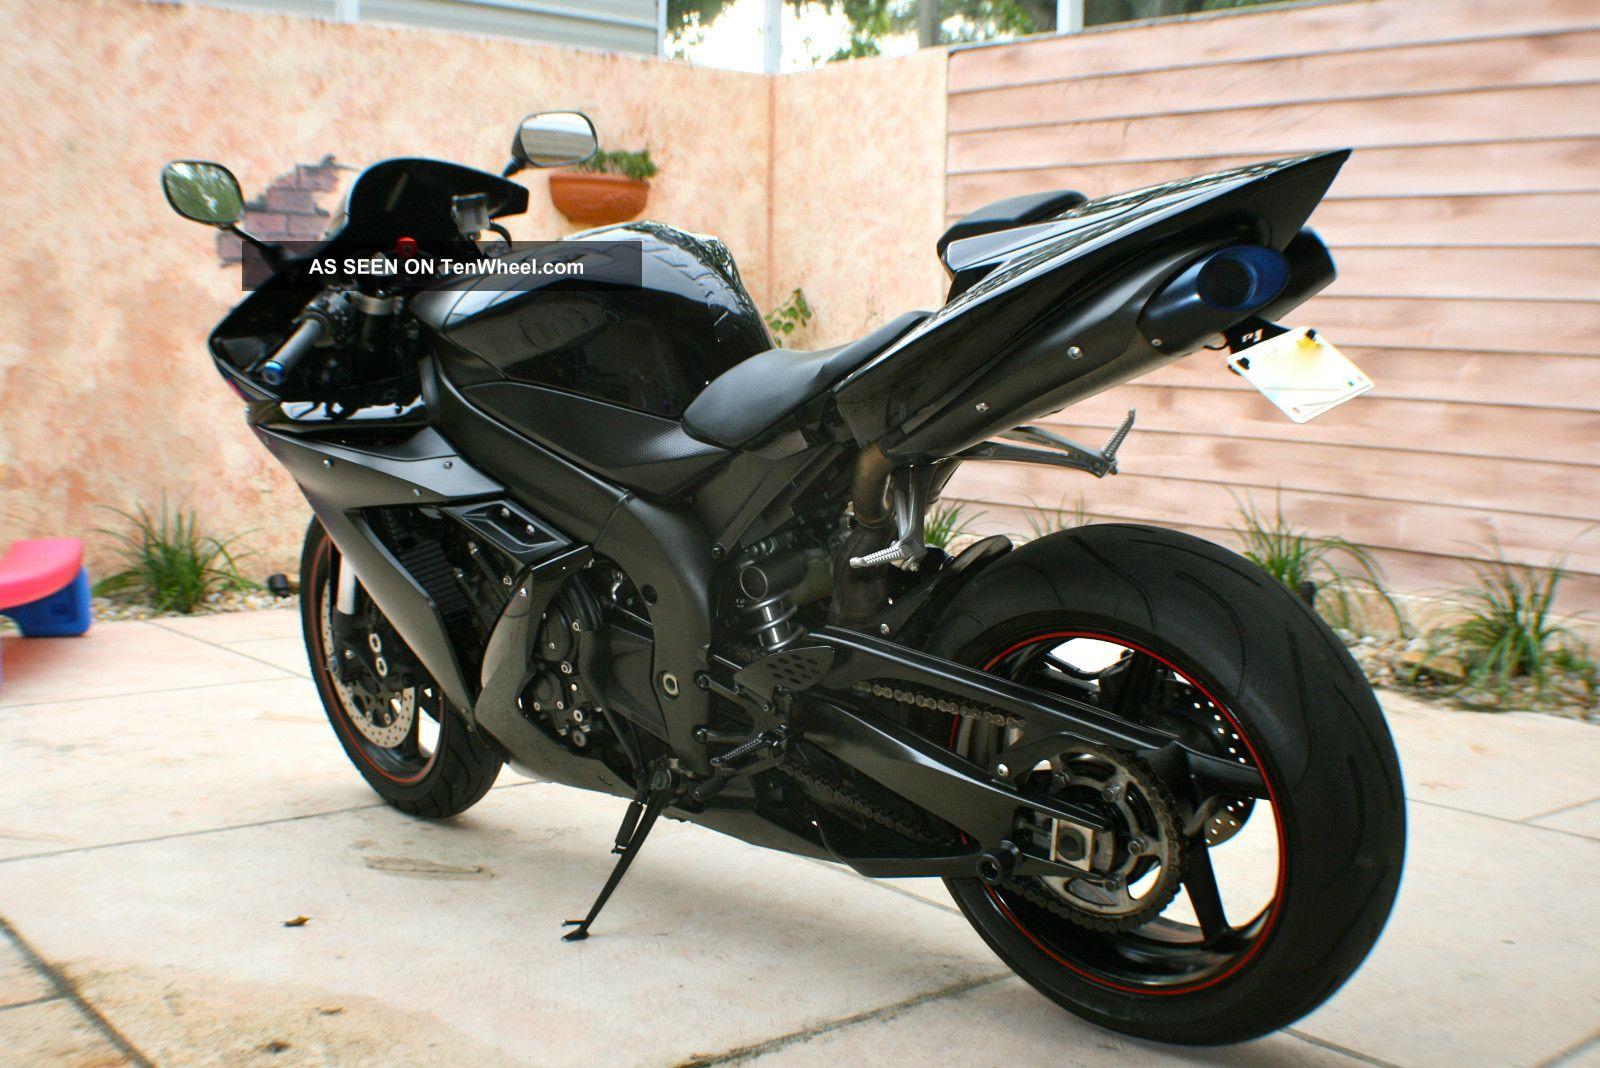 2006 yamaha r1 raven